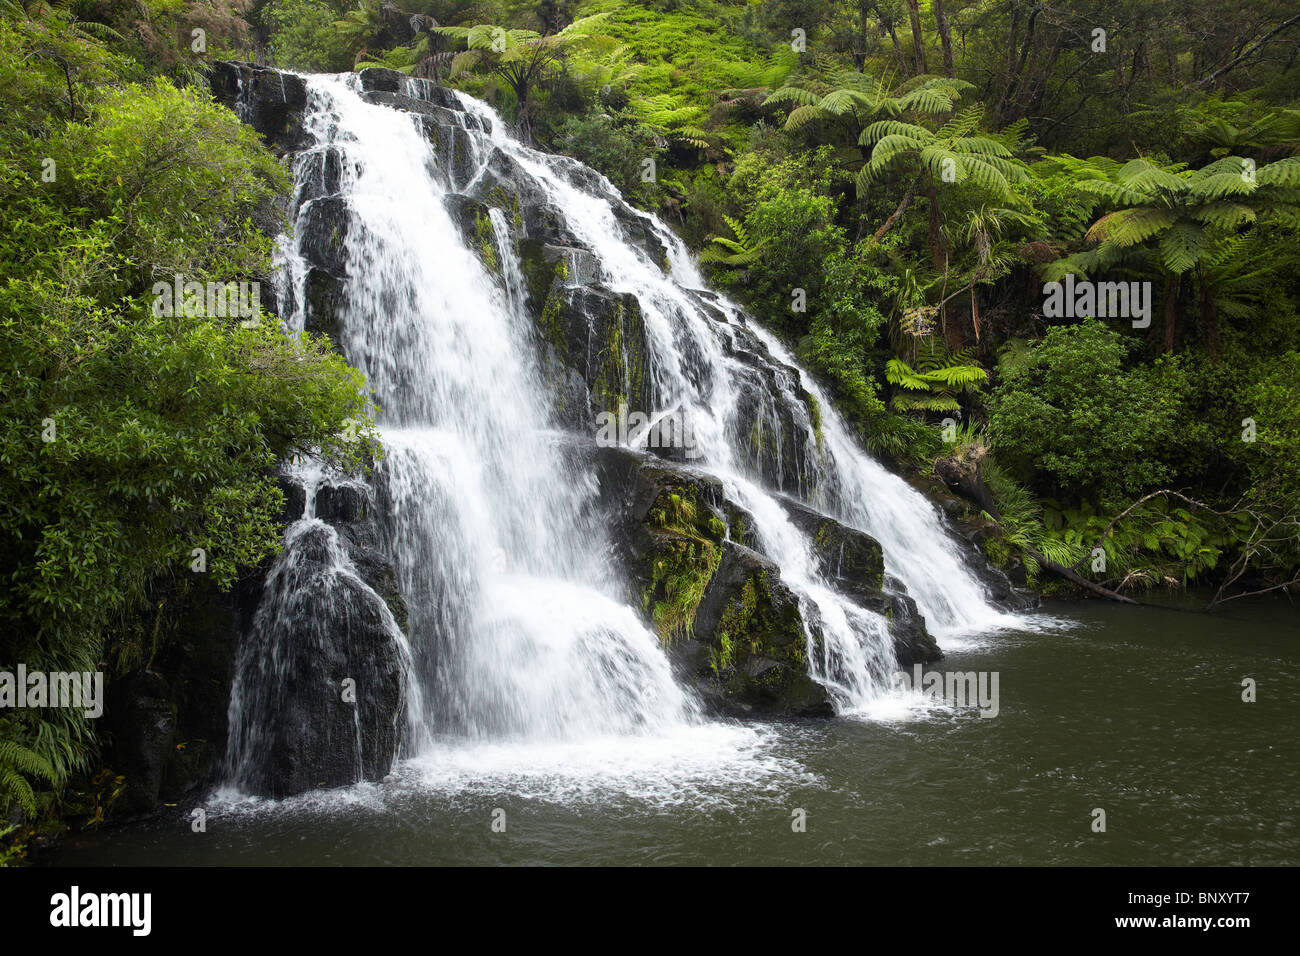 Owharoa Karangahake gorges, chutes, près de Paeroa, Waikato, Nouvelle-Zélande, île du Nord Photo Stock